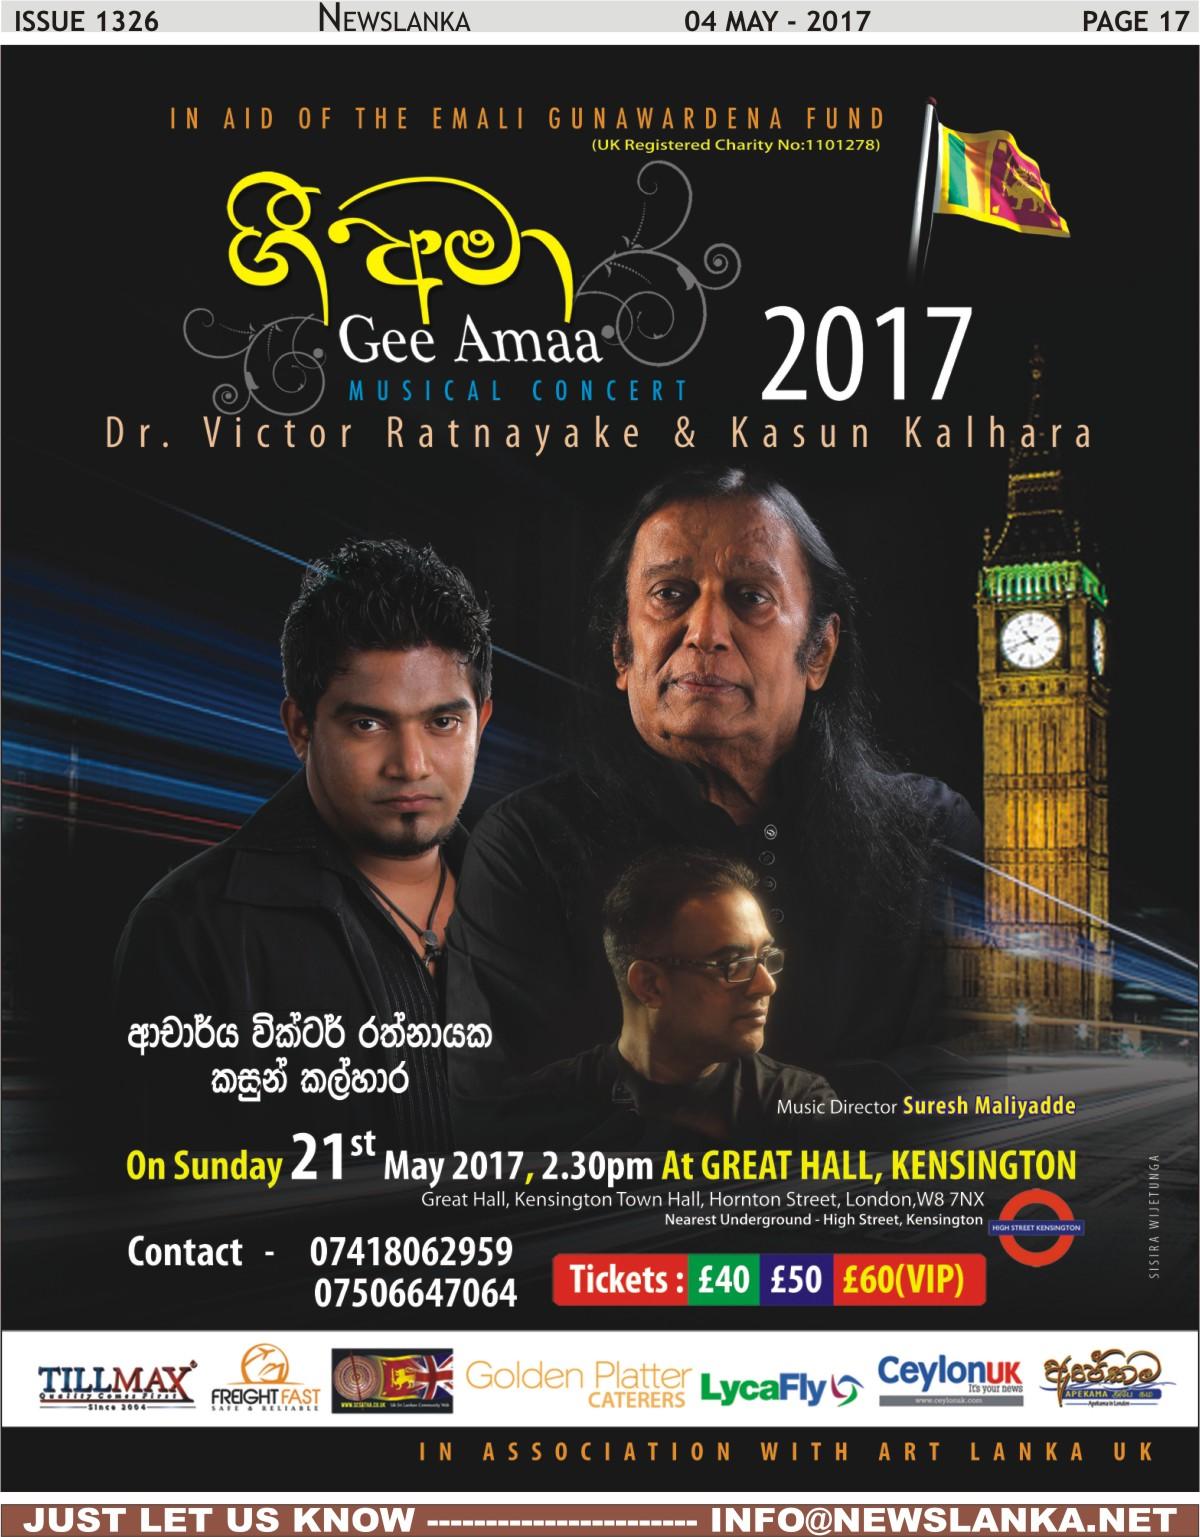 Gee Ama Musical Concert ft. Dr Victor Rathnayake & Kasun Kalahara